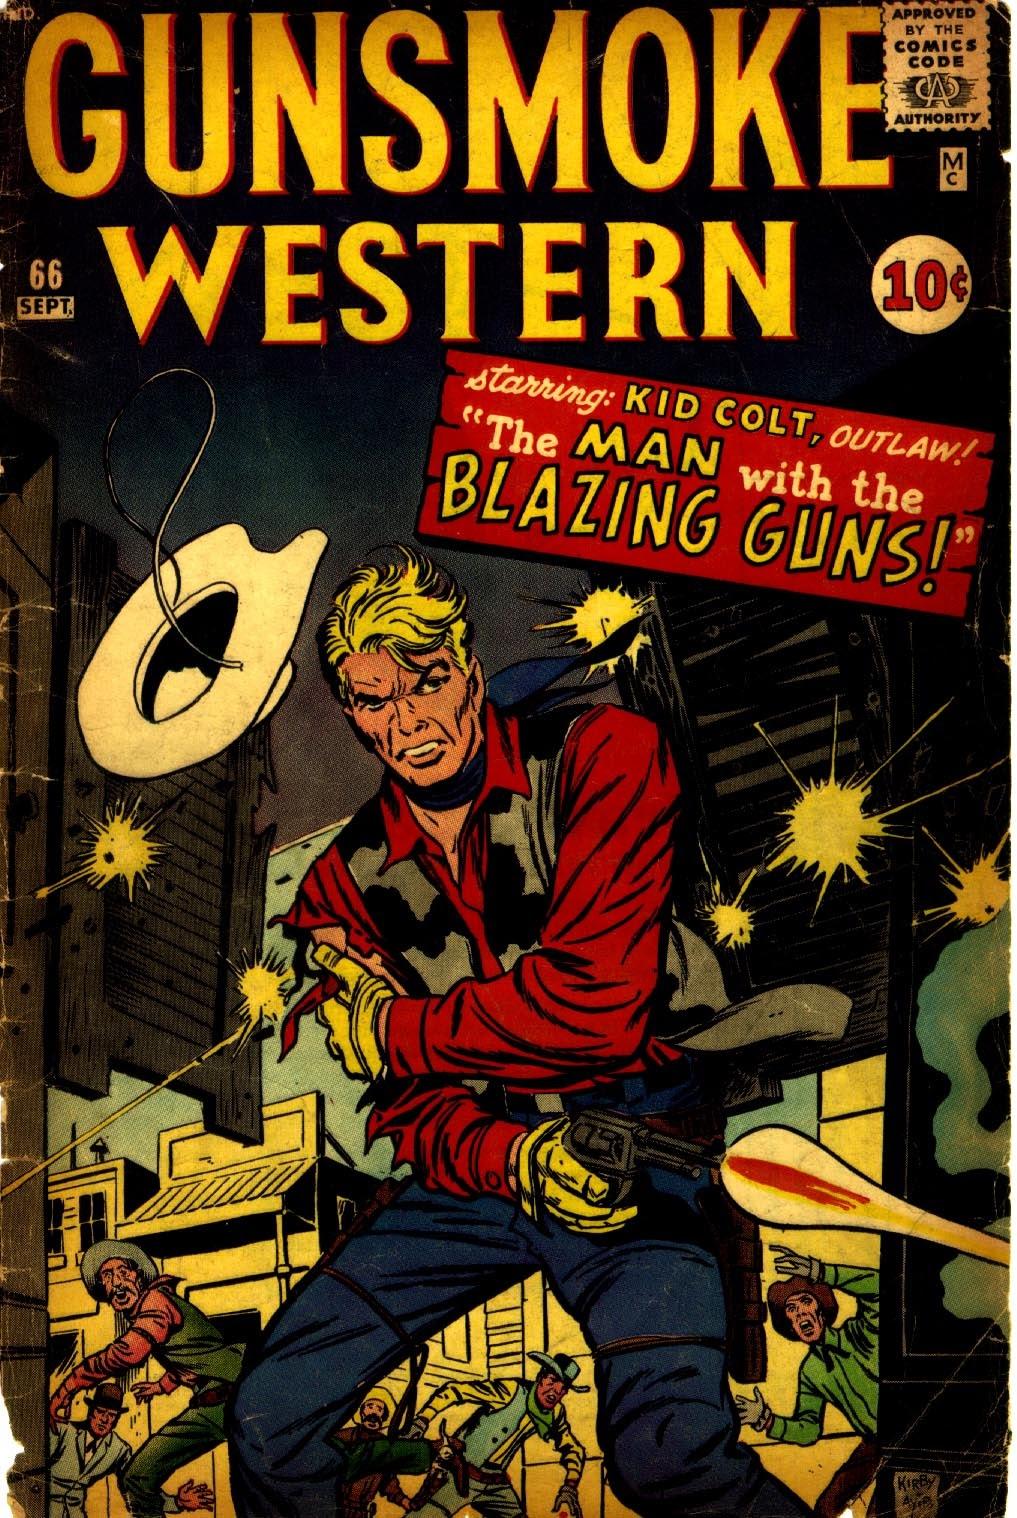 Gunsmoke Western issue 66 - Page 1